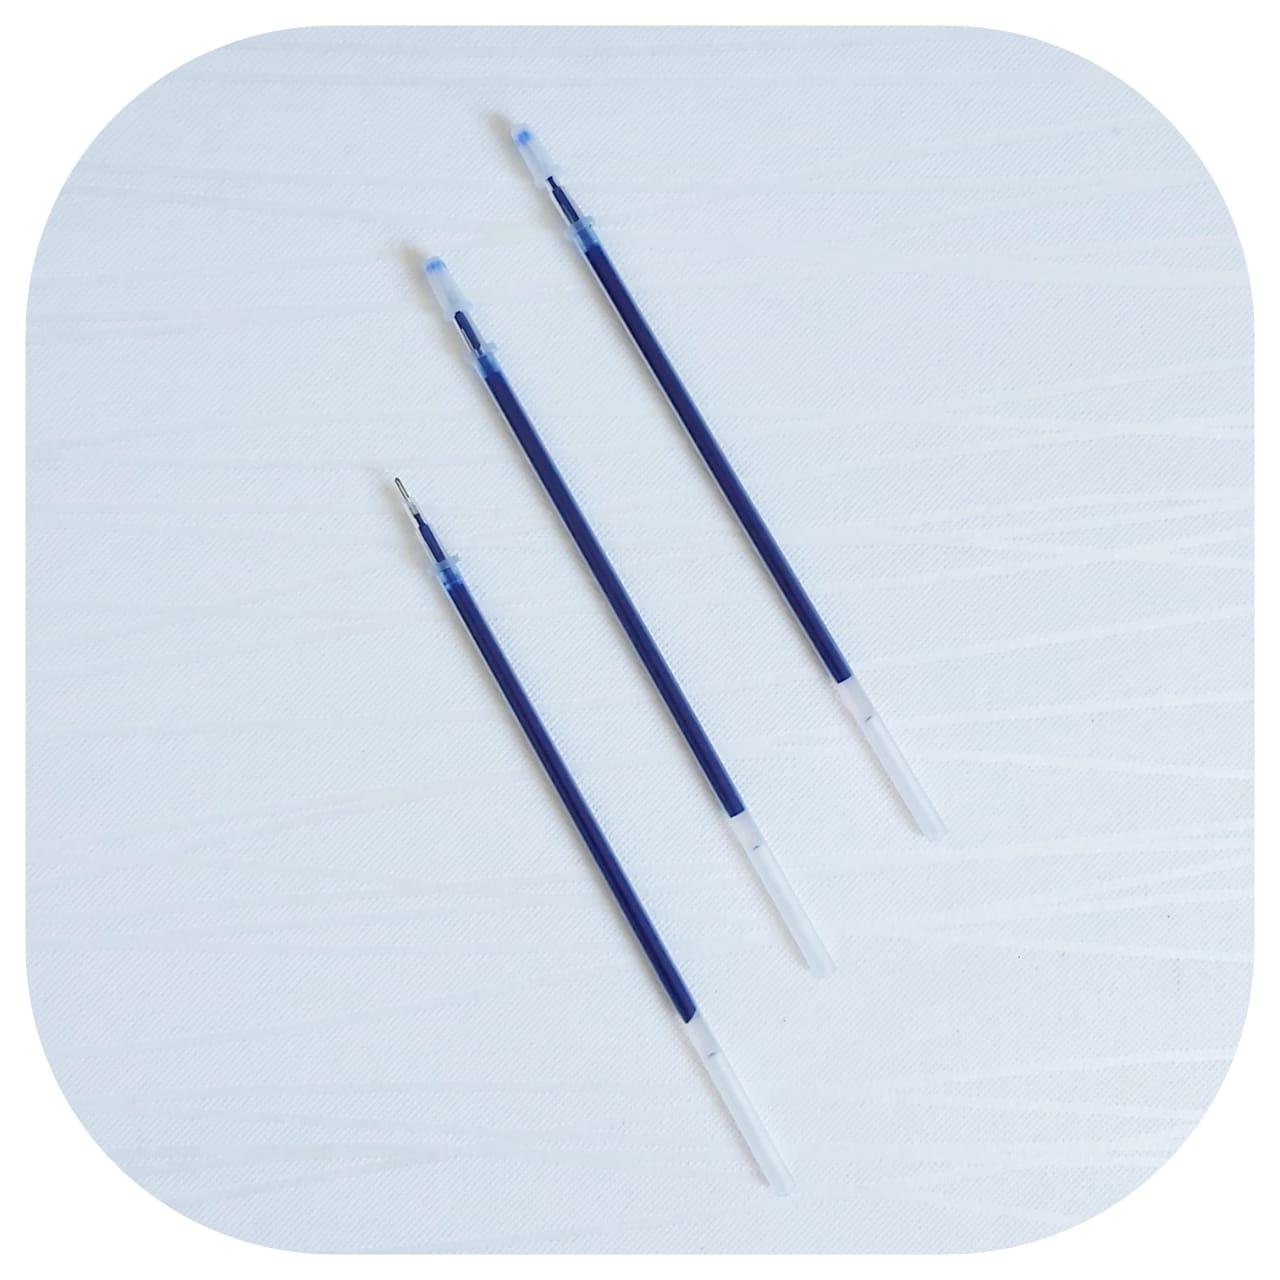 Kit 3 Cargas/Refis - Tinta Azul - 0,50mm